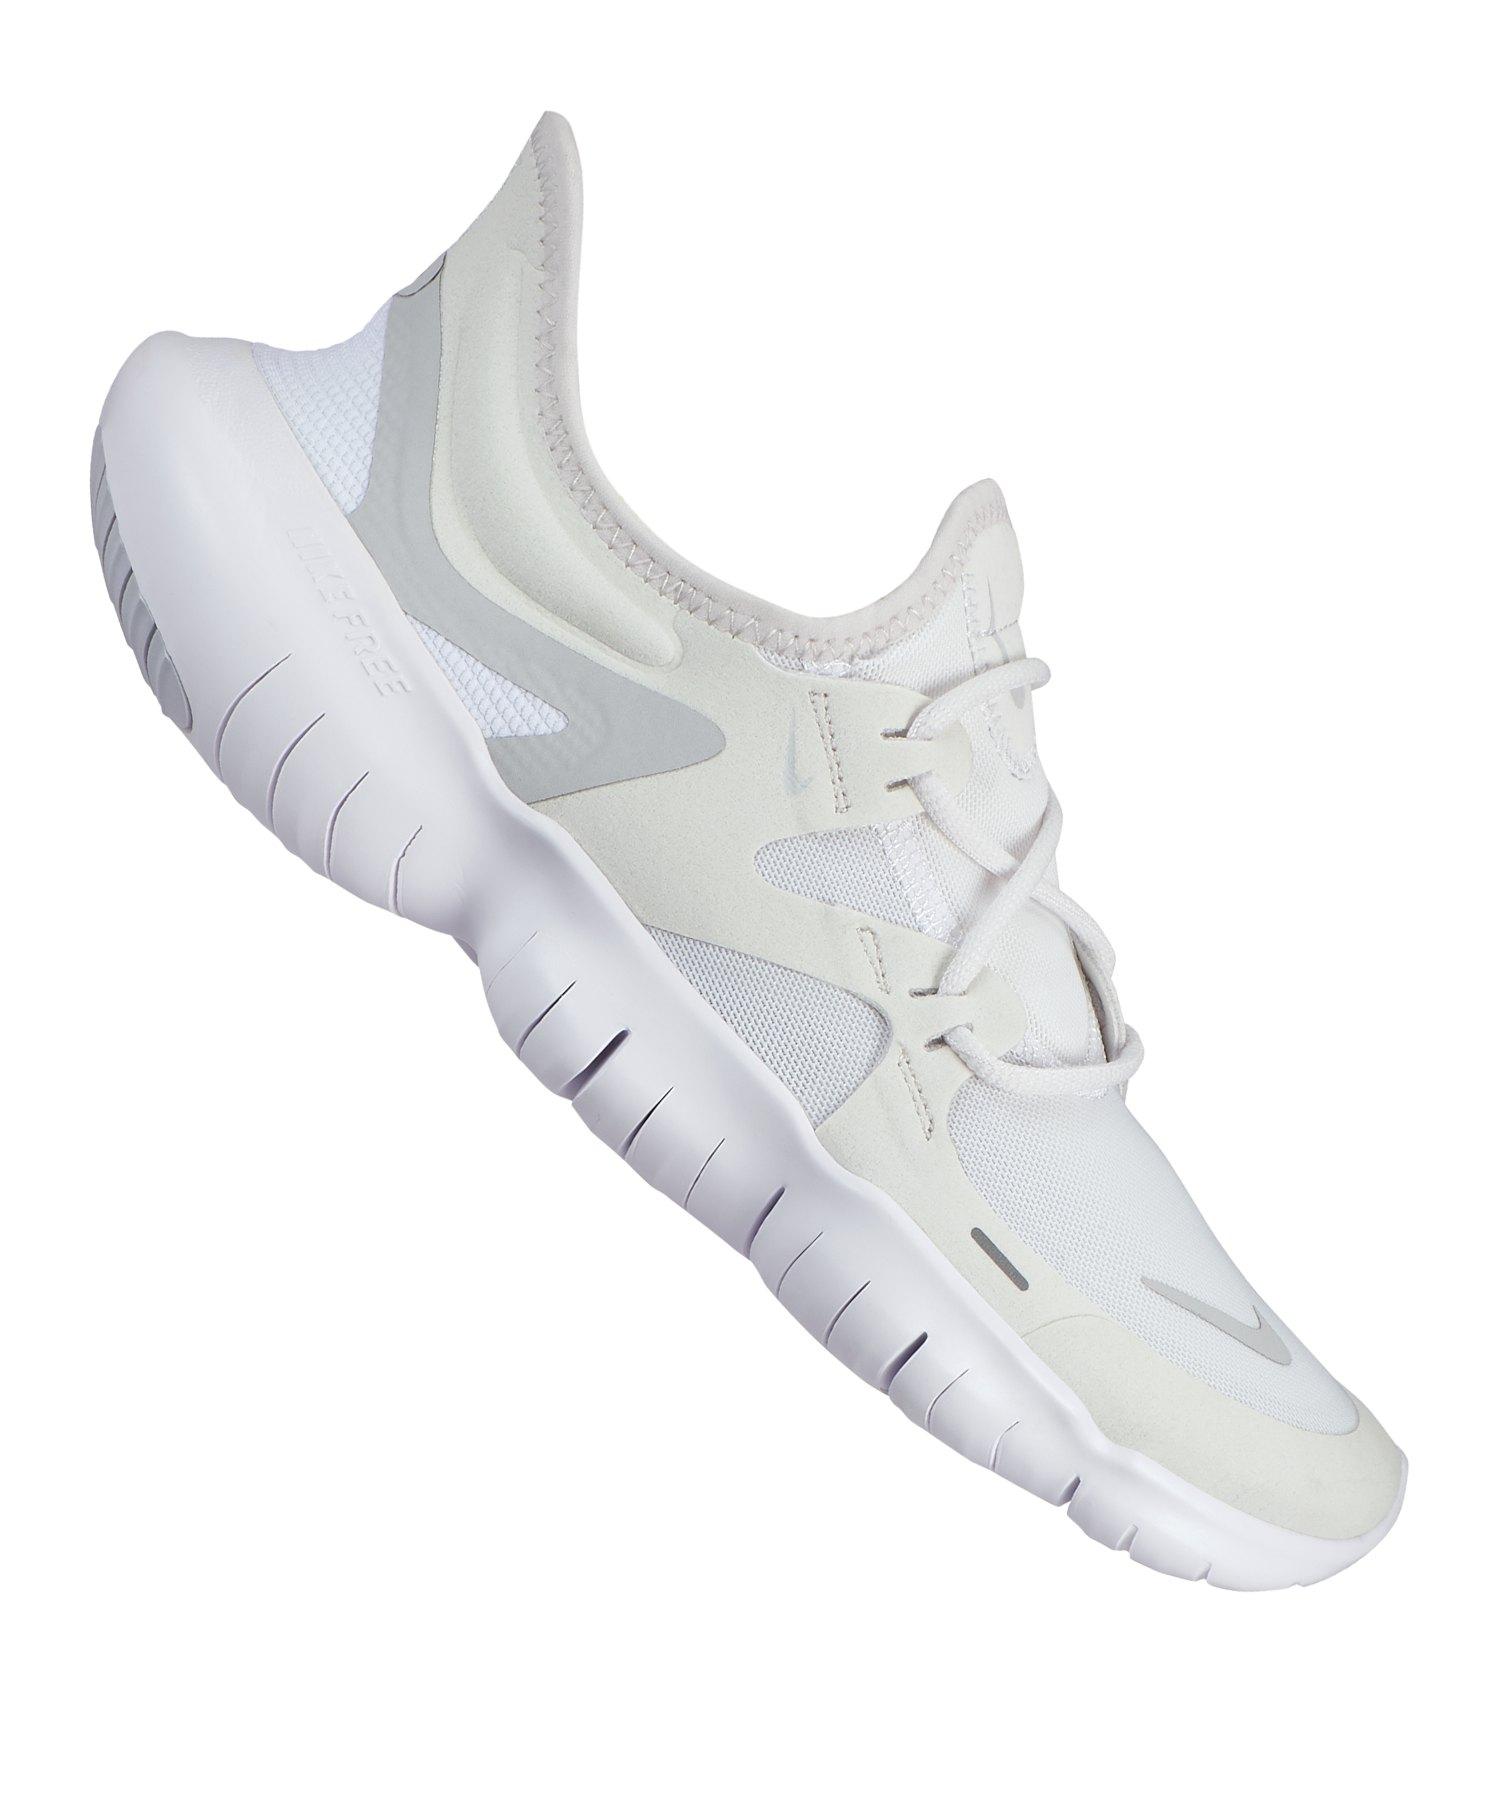 Nike Free RN 5.0 Running Damen Weiss F002